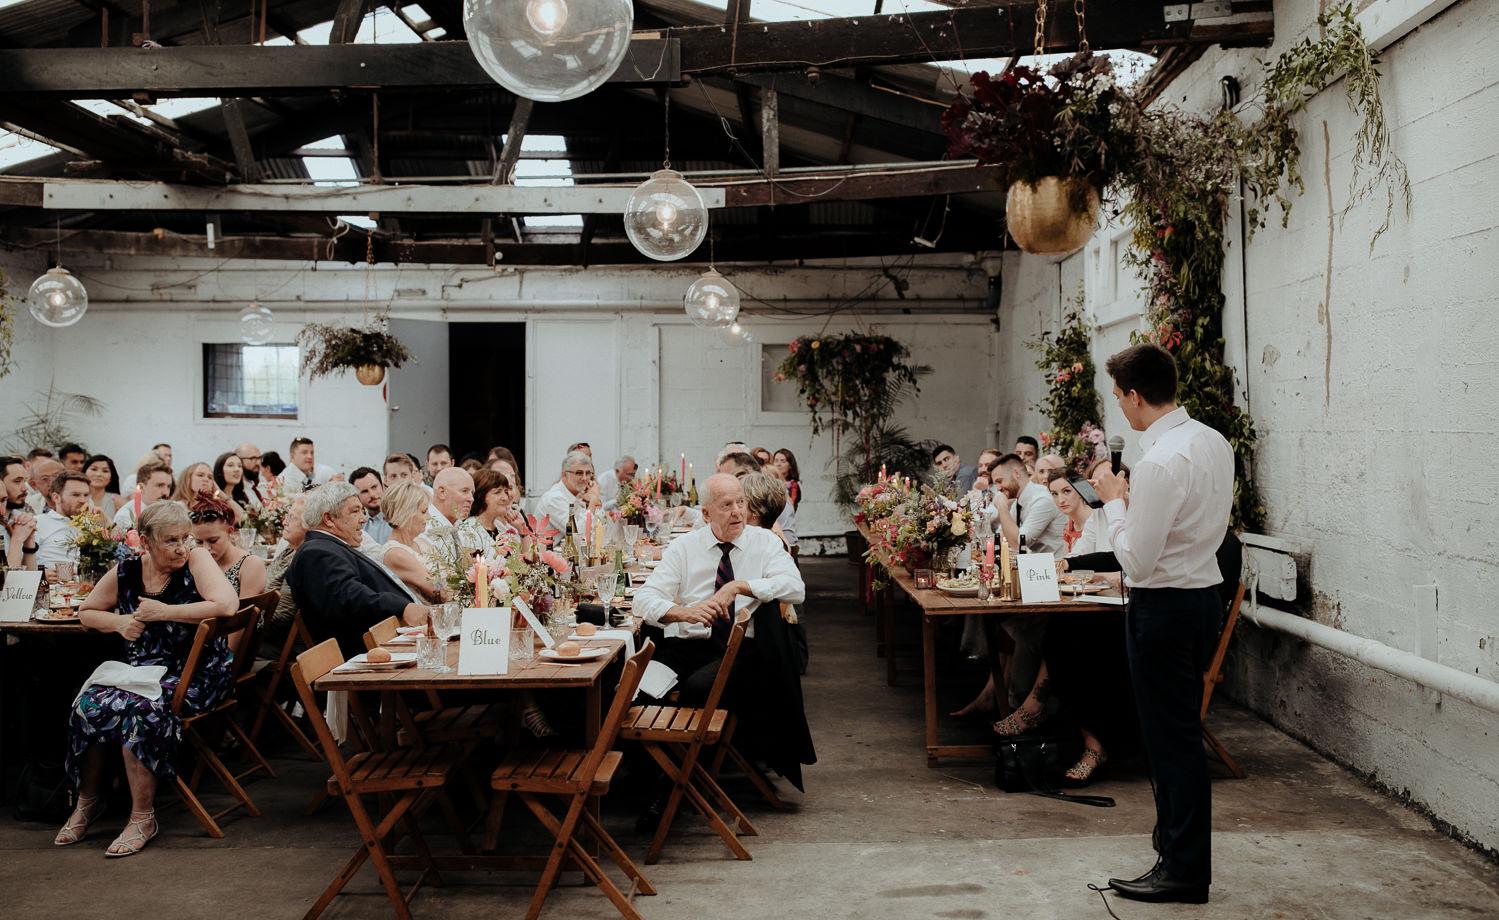 auckland-warehouse-reception-18257.jpg